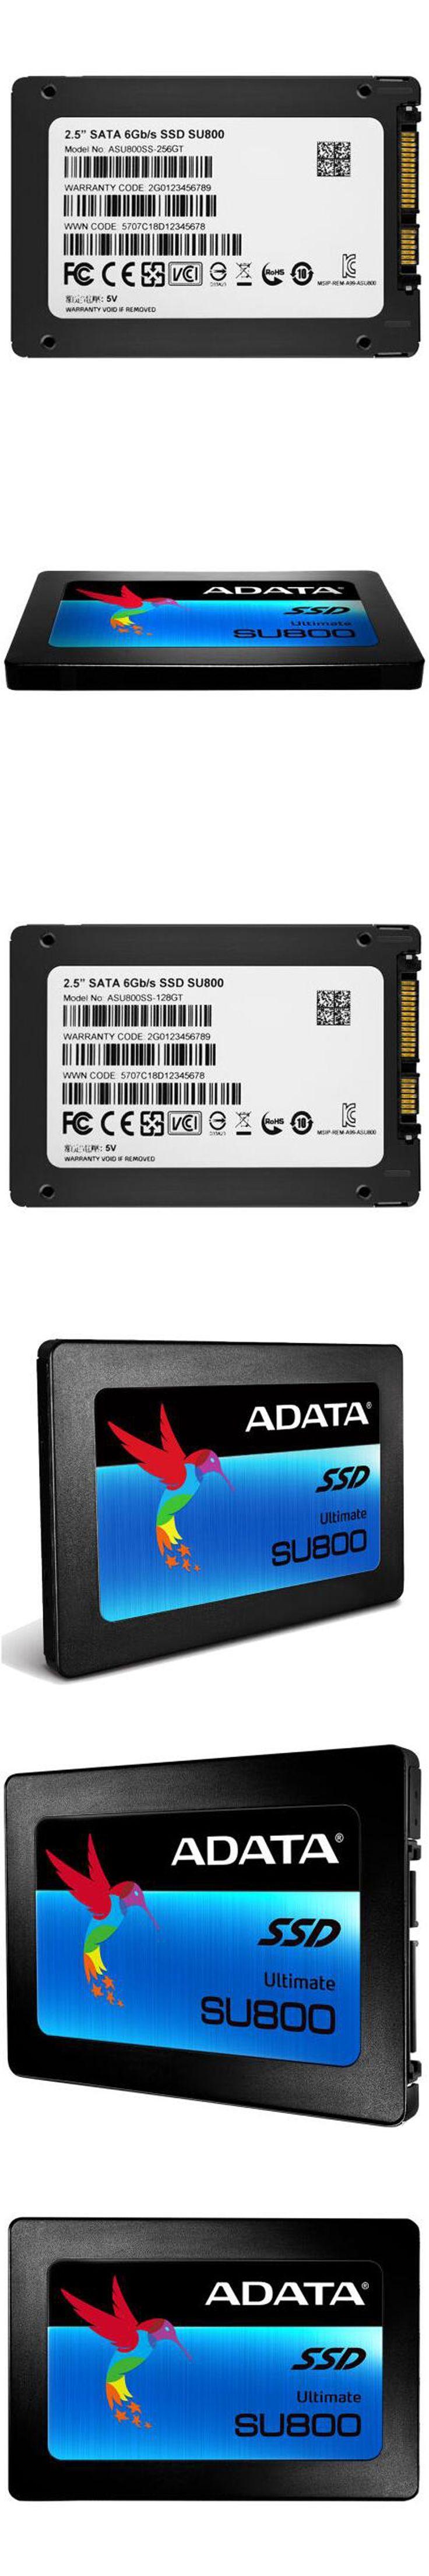 "Brand New ADATA 3D NANO SSD SU800 256GB 128GB 2.5"" Solid State Drive Solid HD Hard Drive Disk SATA3 hdd disk For Laptop Desktop"